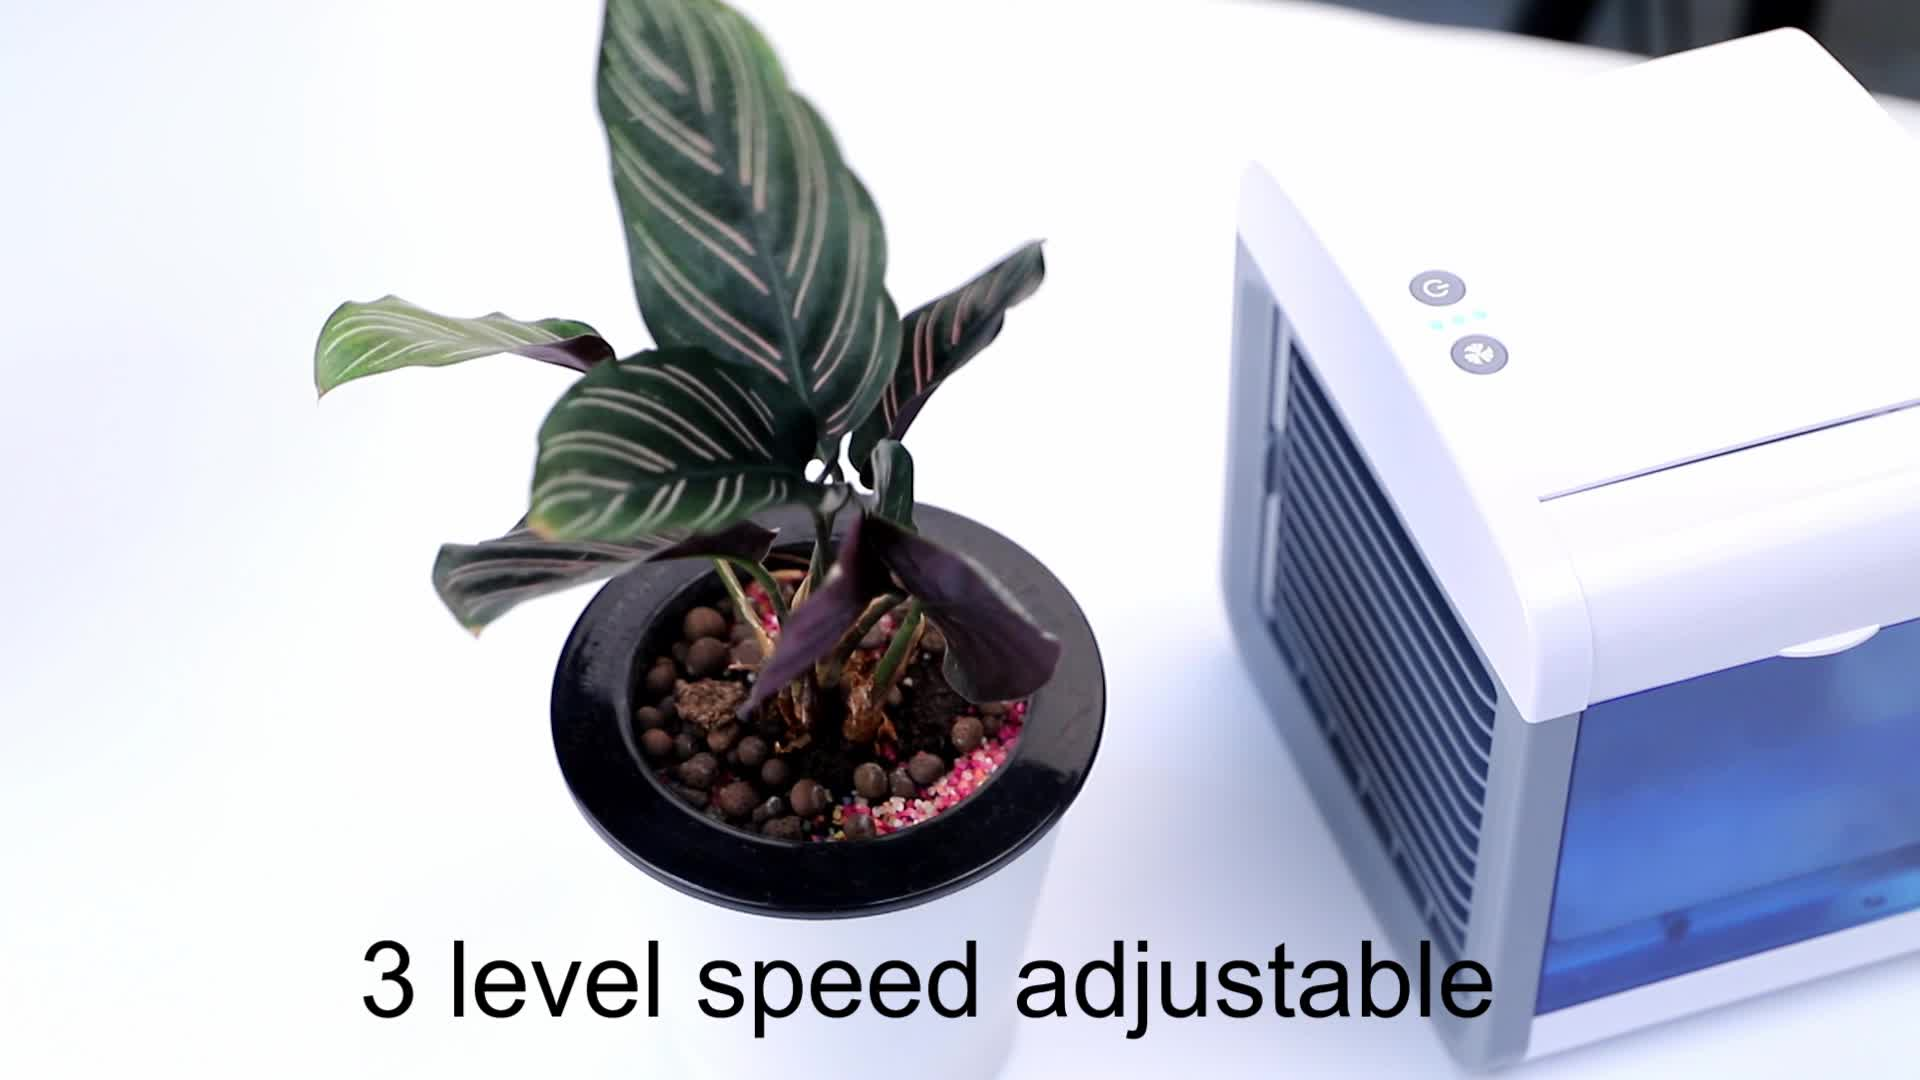 Hot sale mini USB Portable Personal Space Desk top Air Cooler Portable Air Conditioner Fan